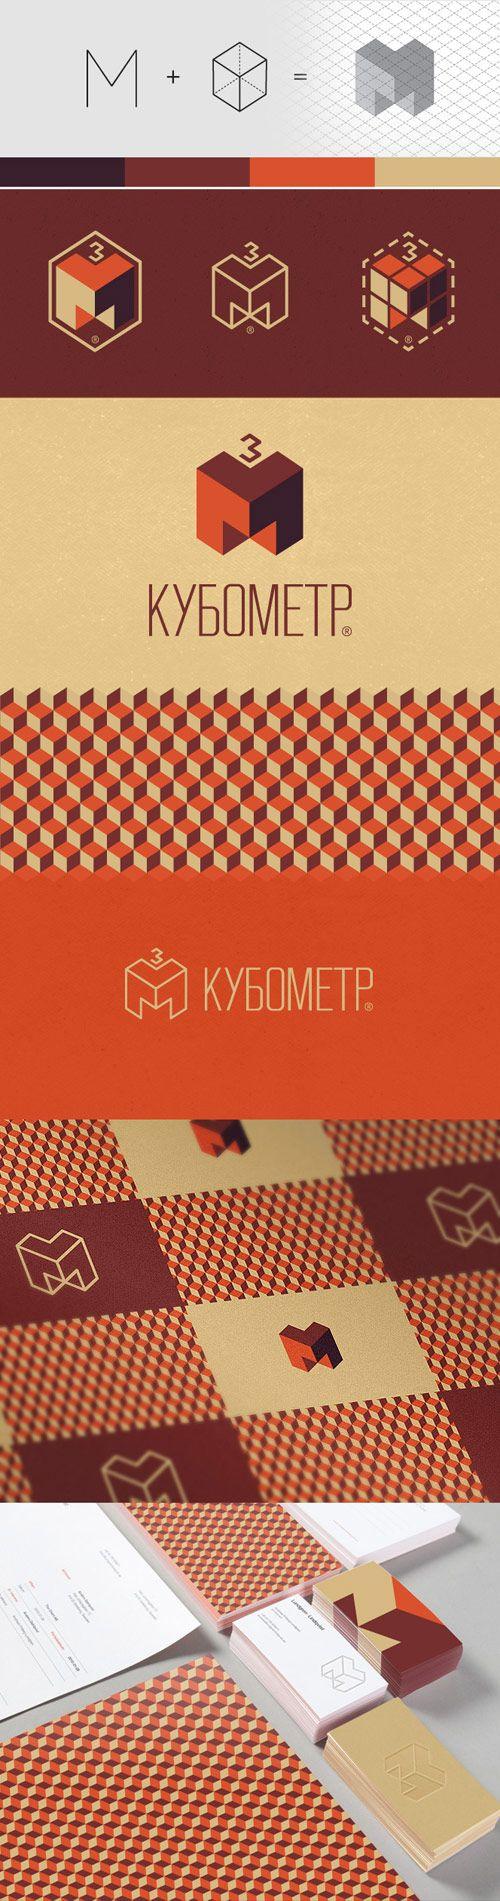 06 cubicmeter in Inspiring Examples of Branding & Corporate Identity Design - Graphic Design